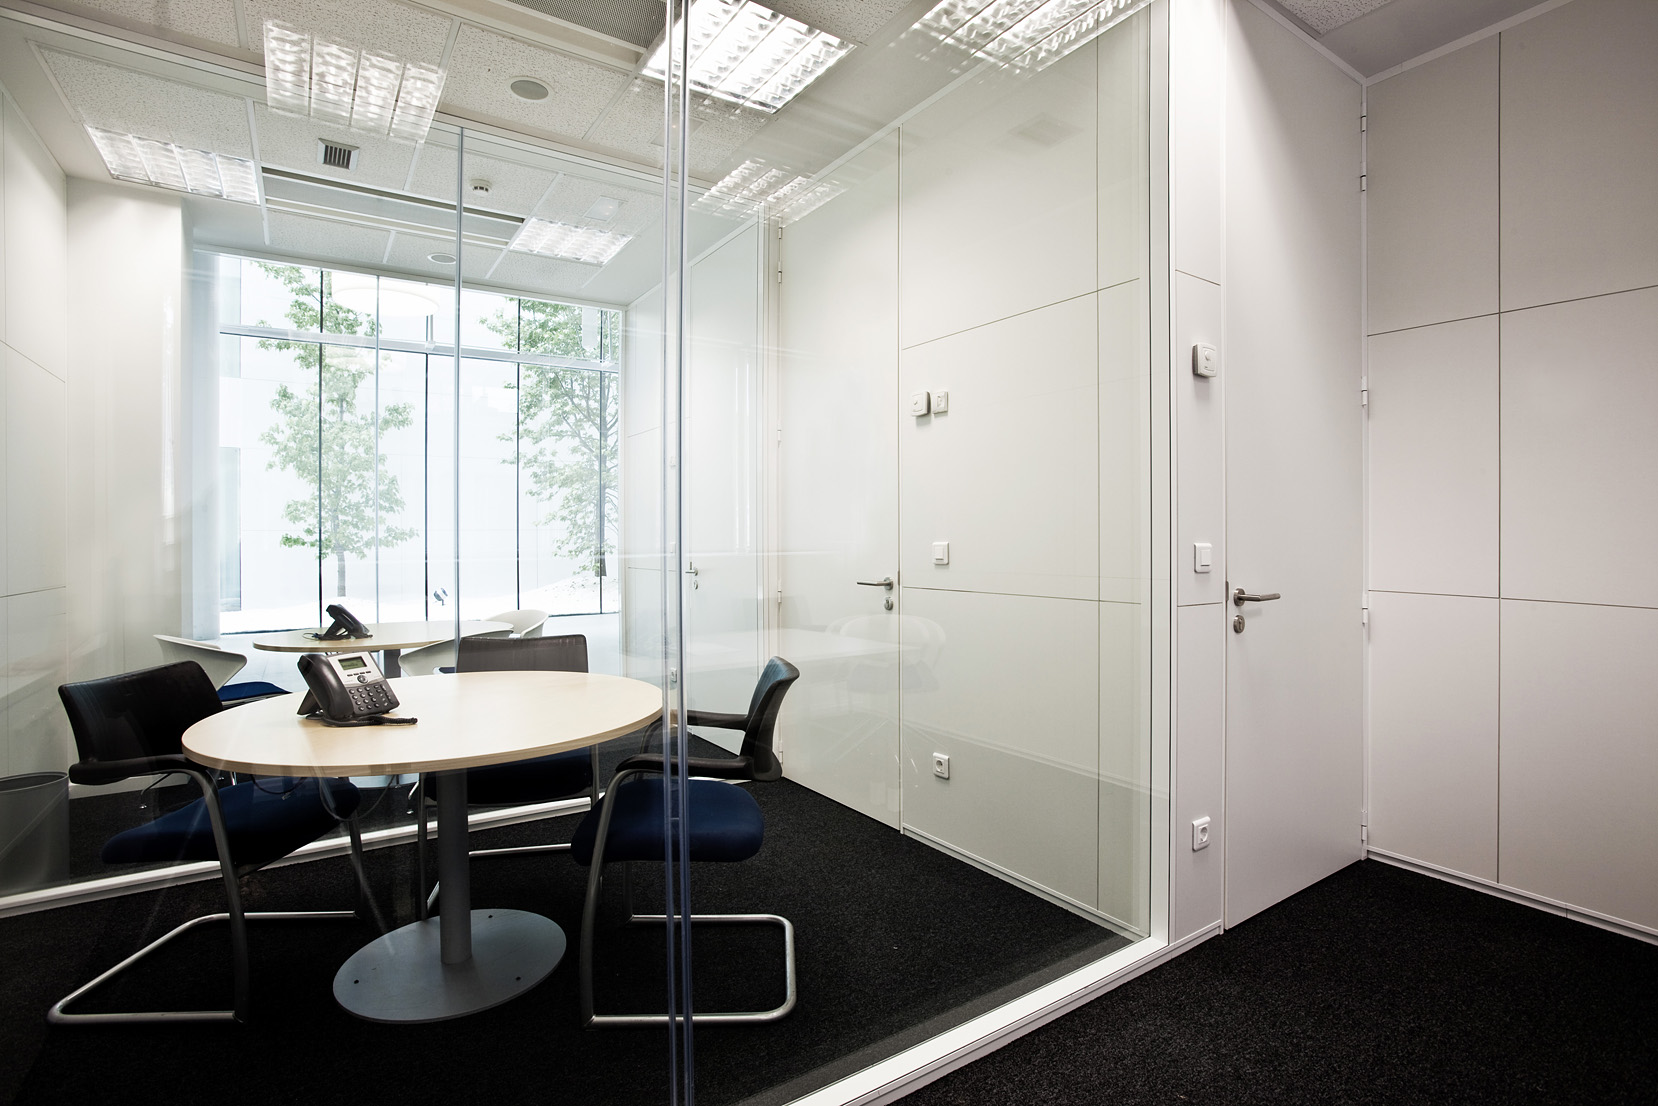 Interiores oficinas gesalia for Oficinas interiores